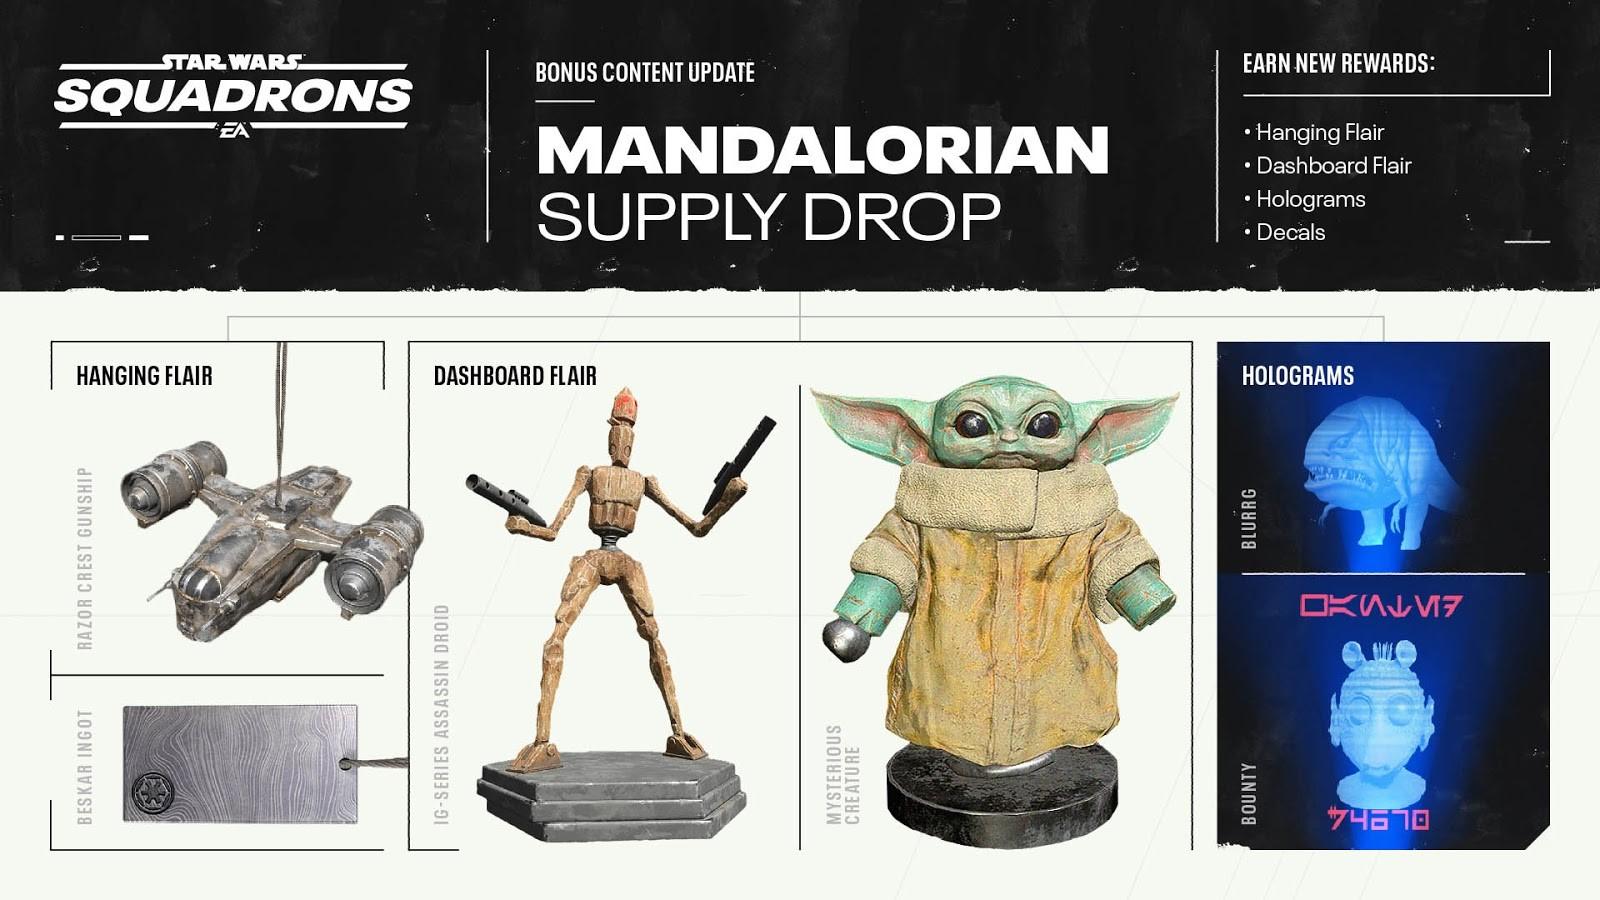 Star Wars: Squadrons - The Mandalorian